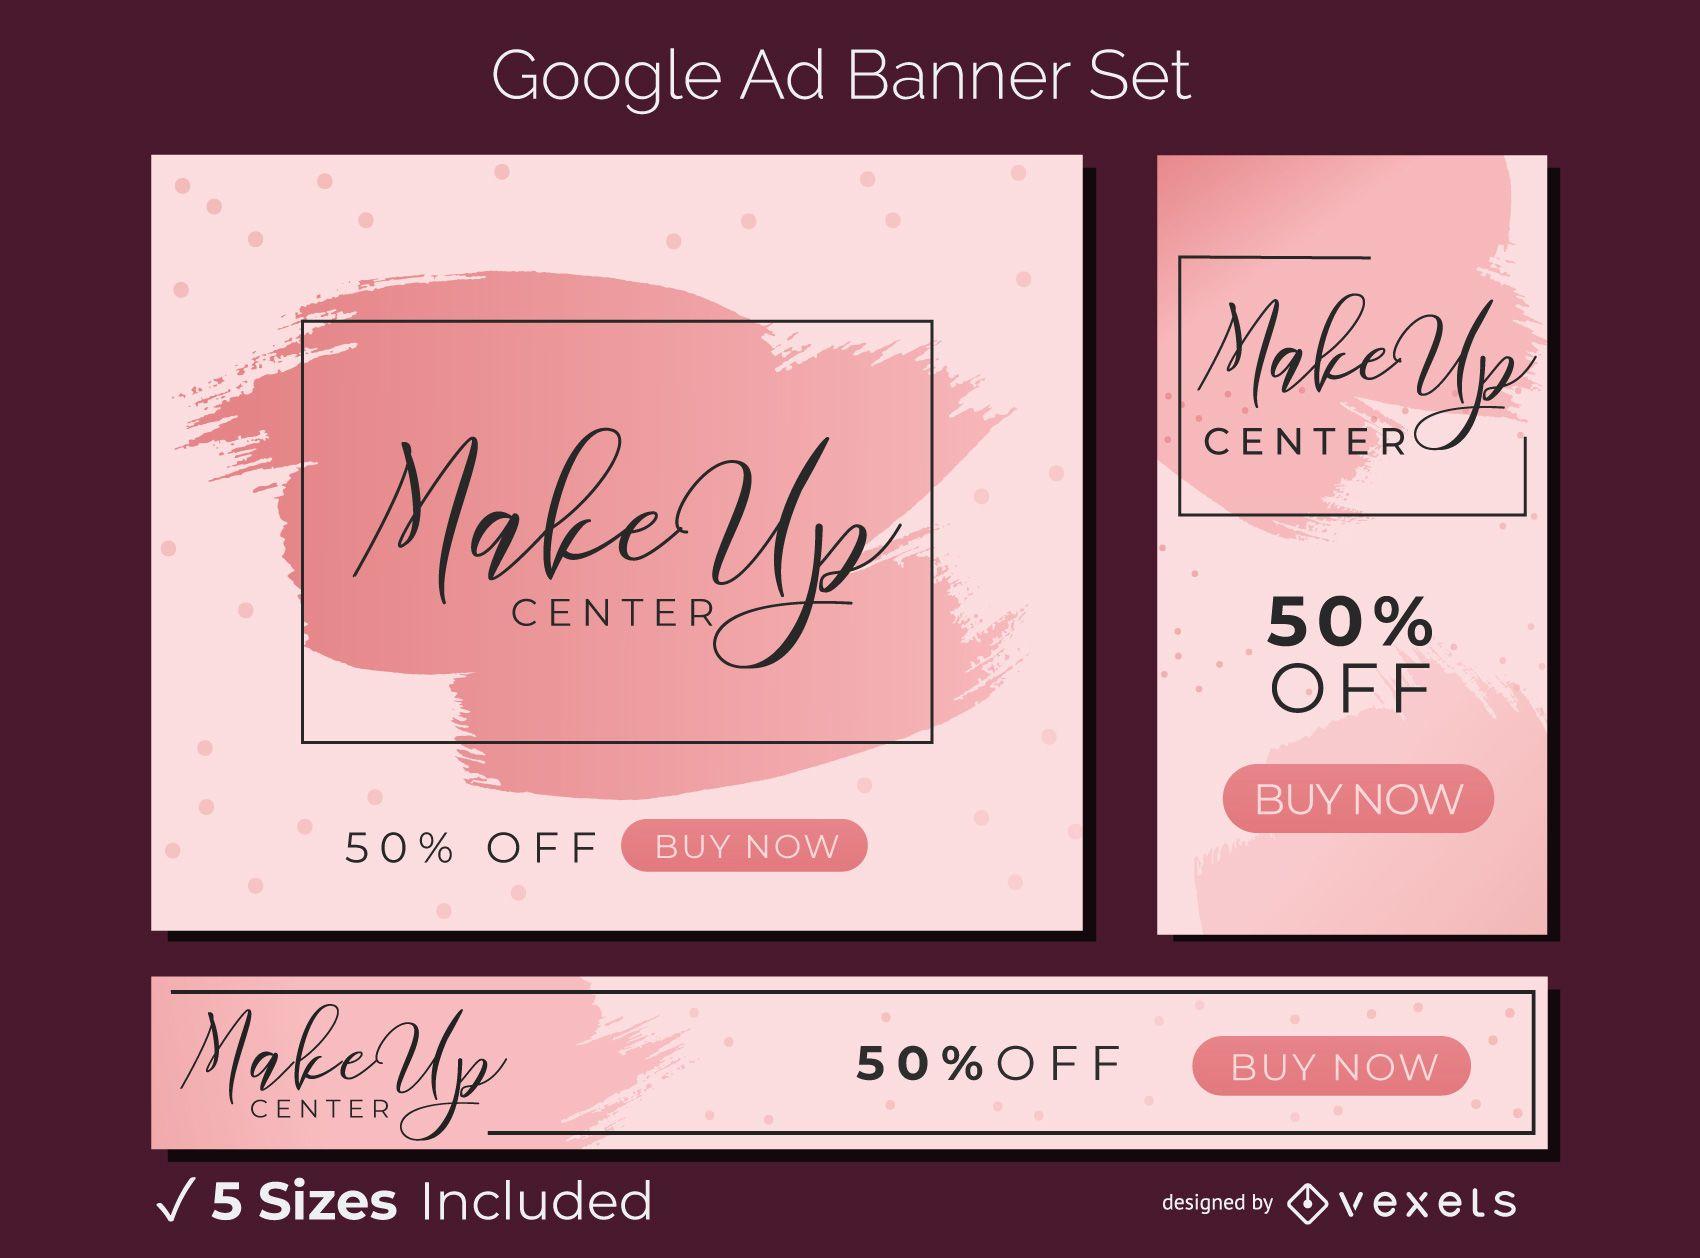 Makeup ad banner set